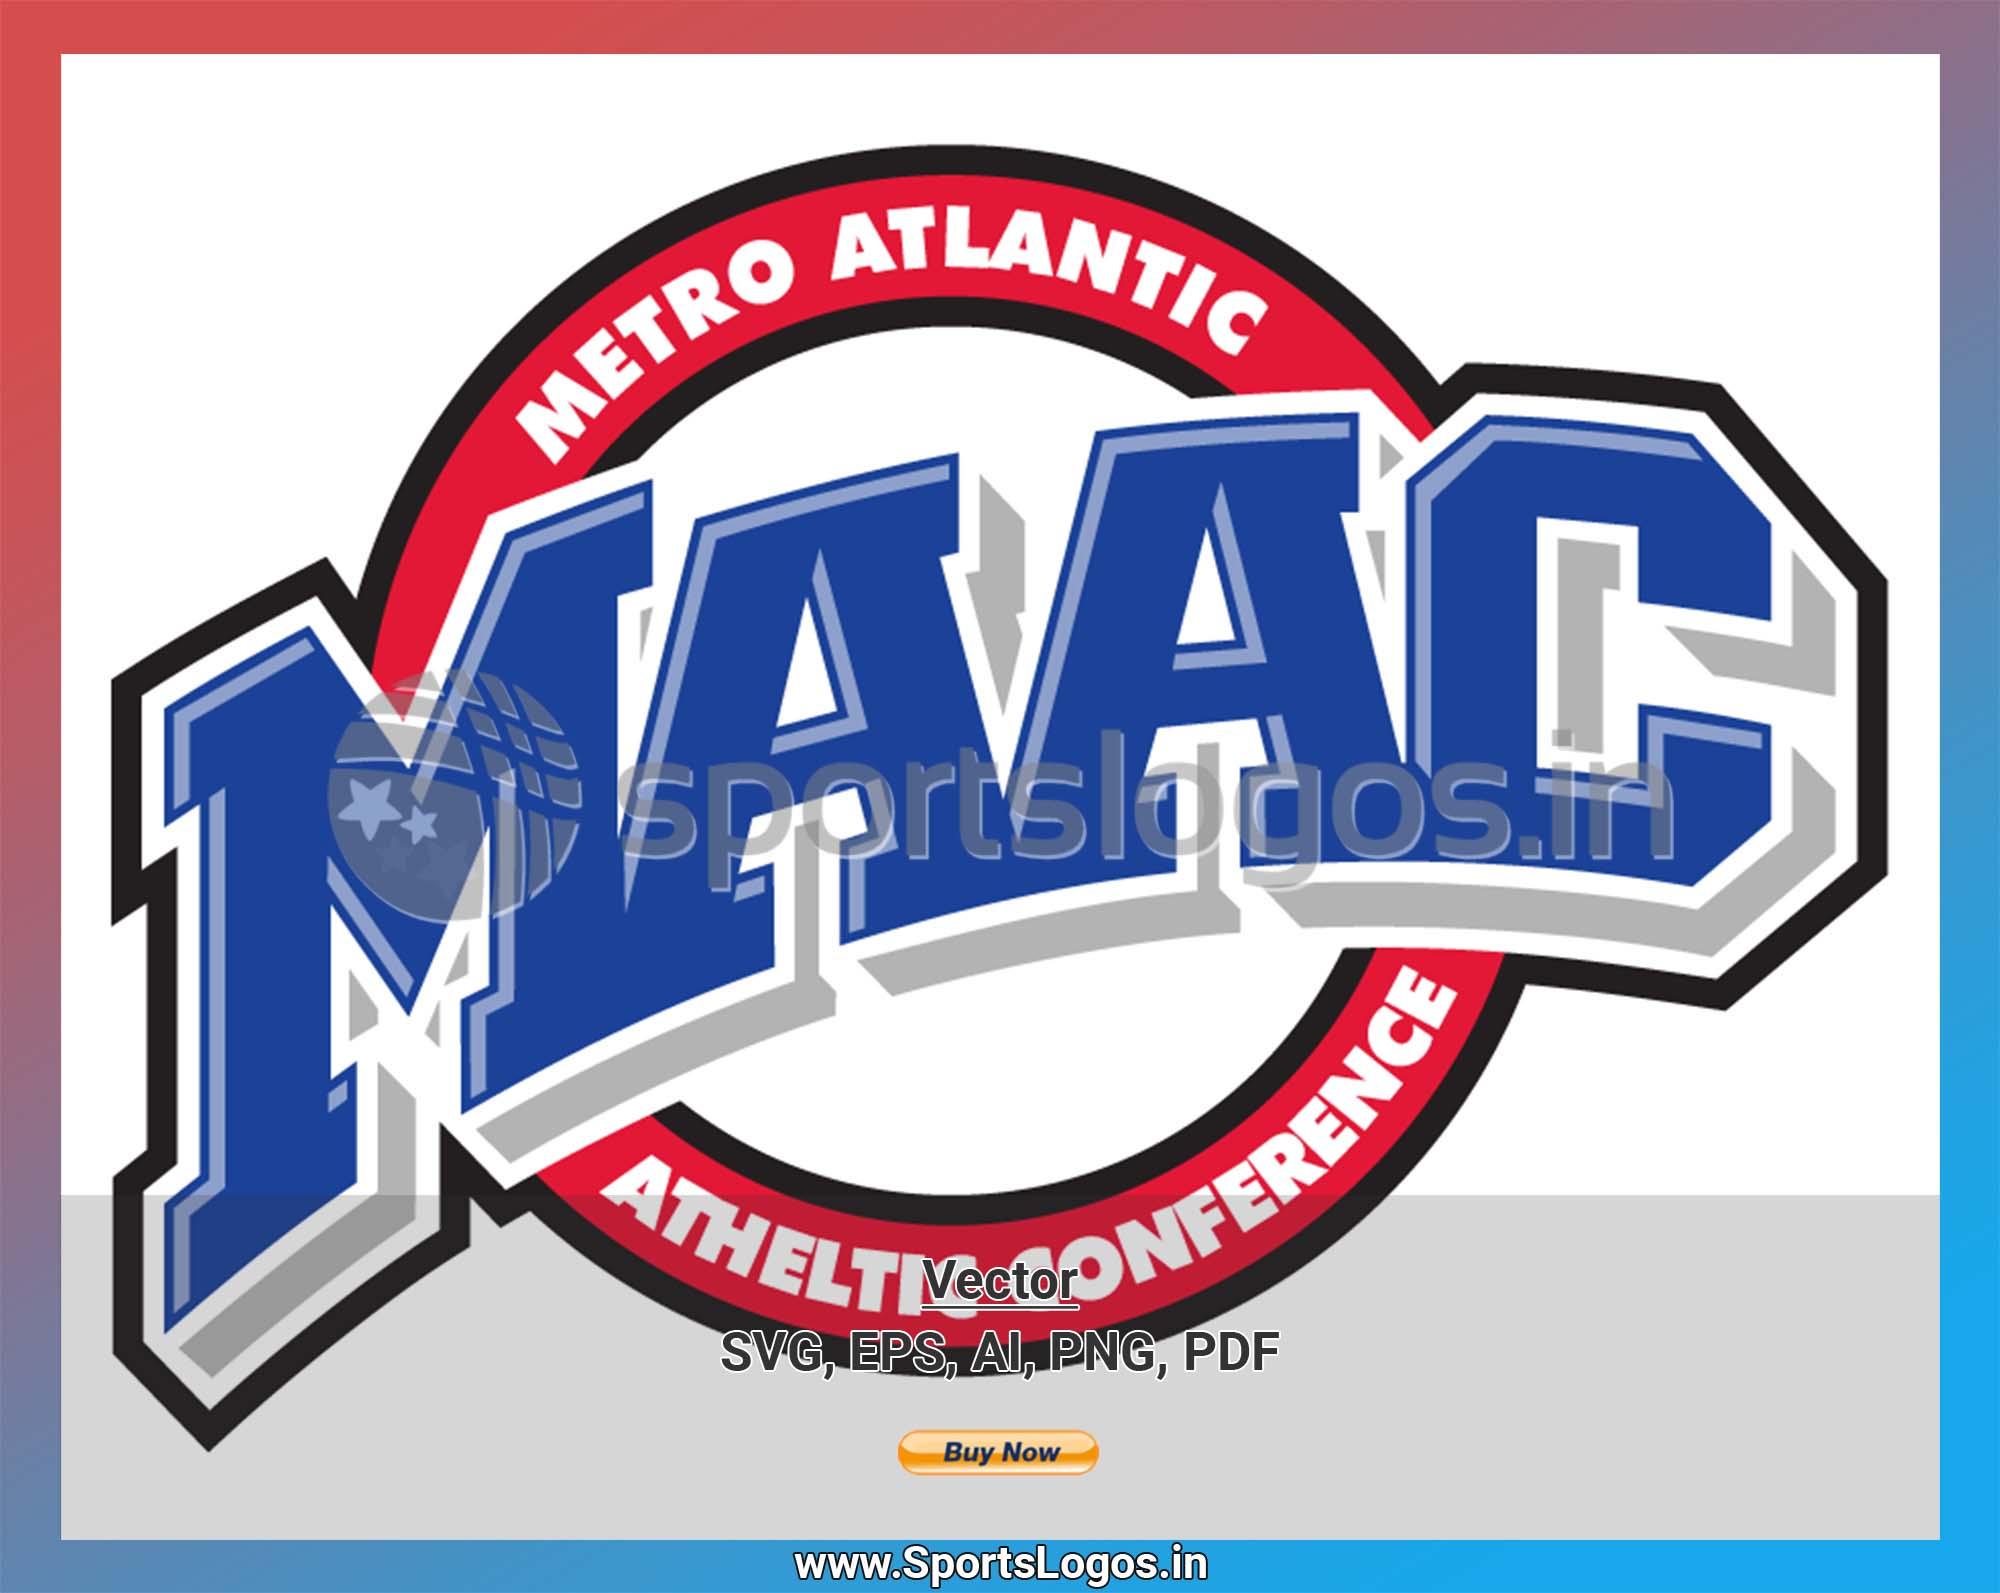 Metro Atlantic Athletic Conference.